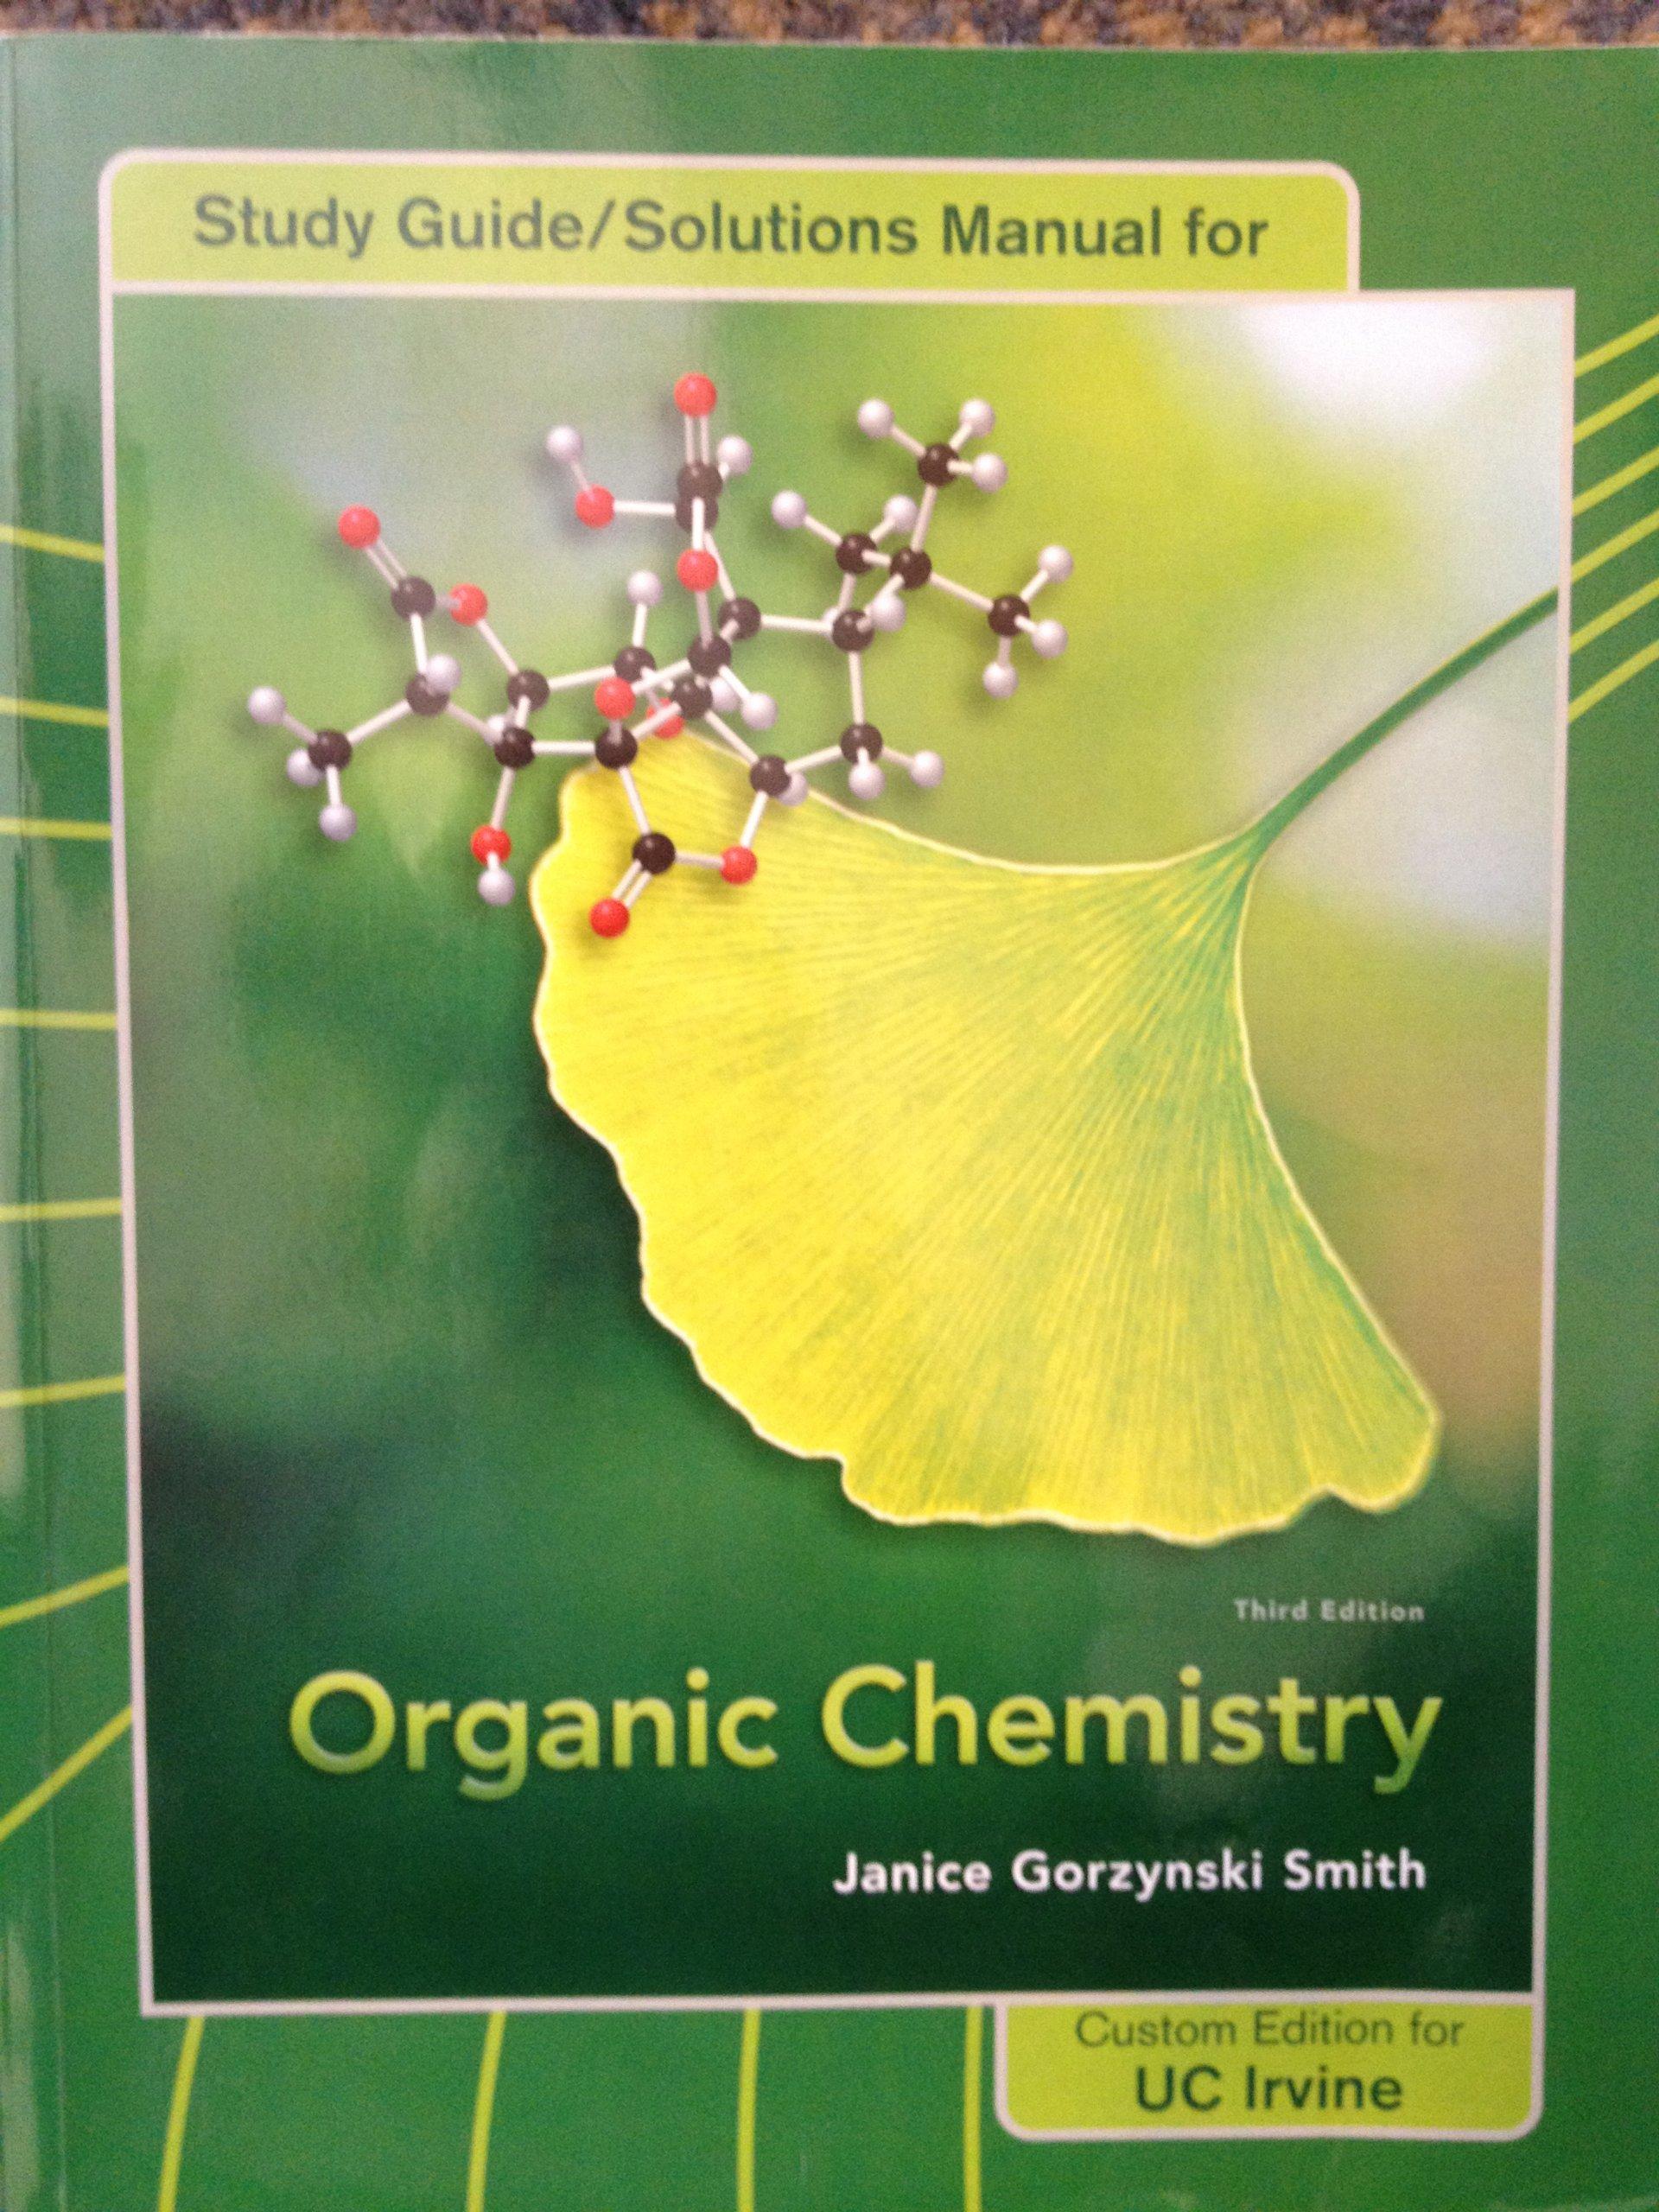 Study Guide/Solutions Manual for Organic Chemistry (Janice Gorzynski Smith  (Third Edition) UC Irvine): Janice Gorzynski Smith: 9780077460501:  Amazon.com: ...